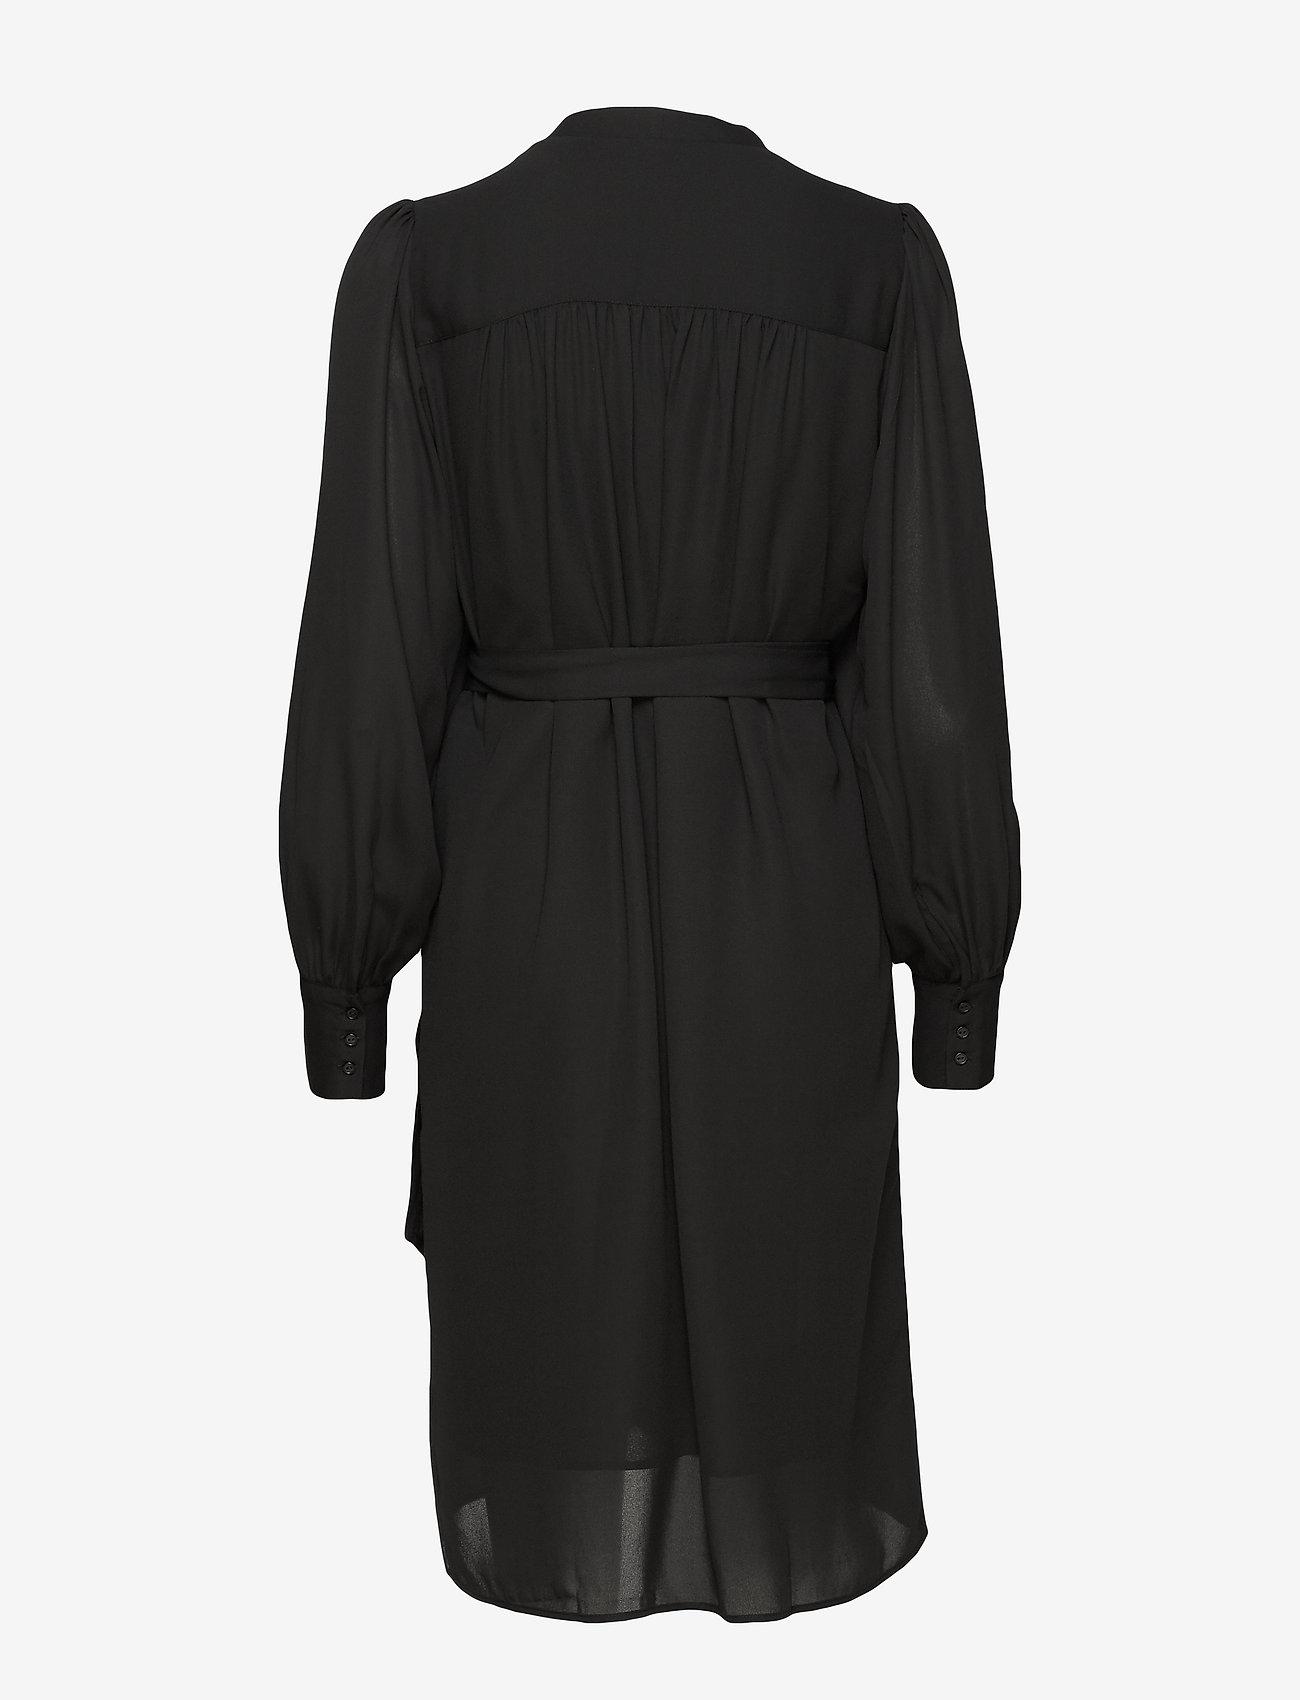 Selected Femme - SLFALVA LS WRAP DRESS NOOS - robes portefeuille - black - 1